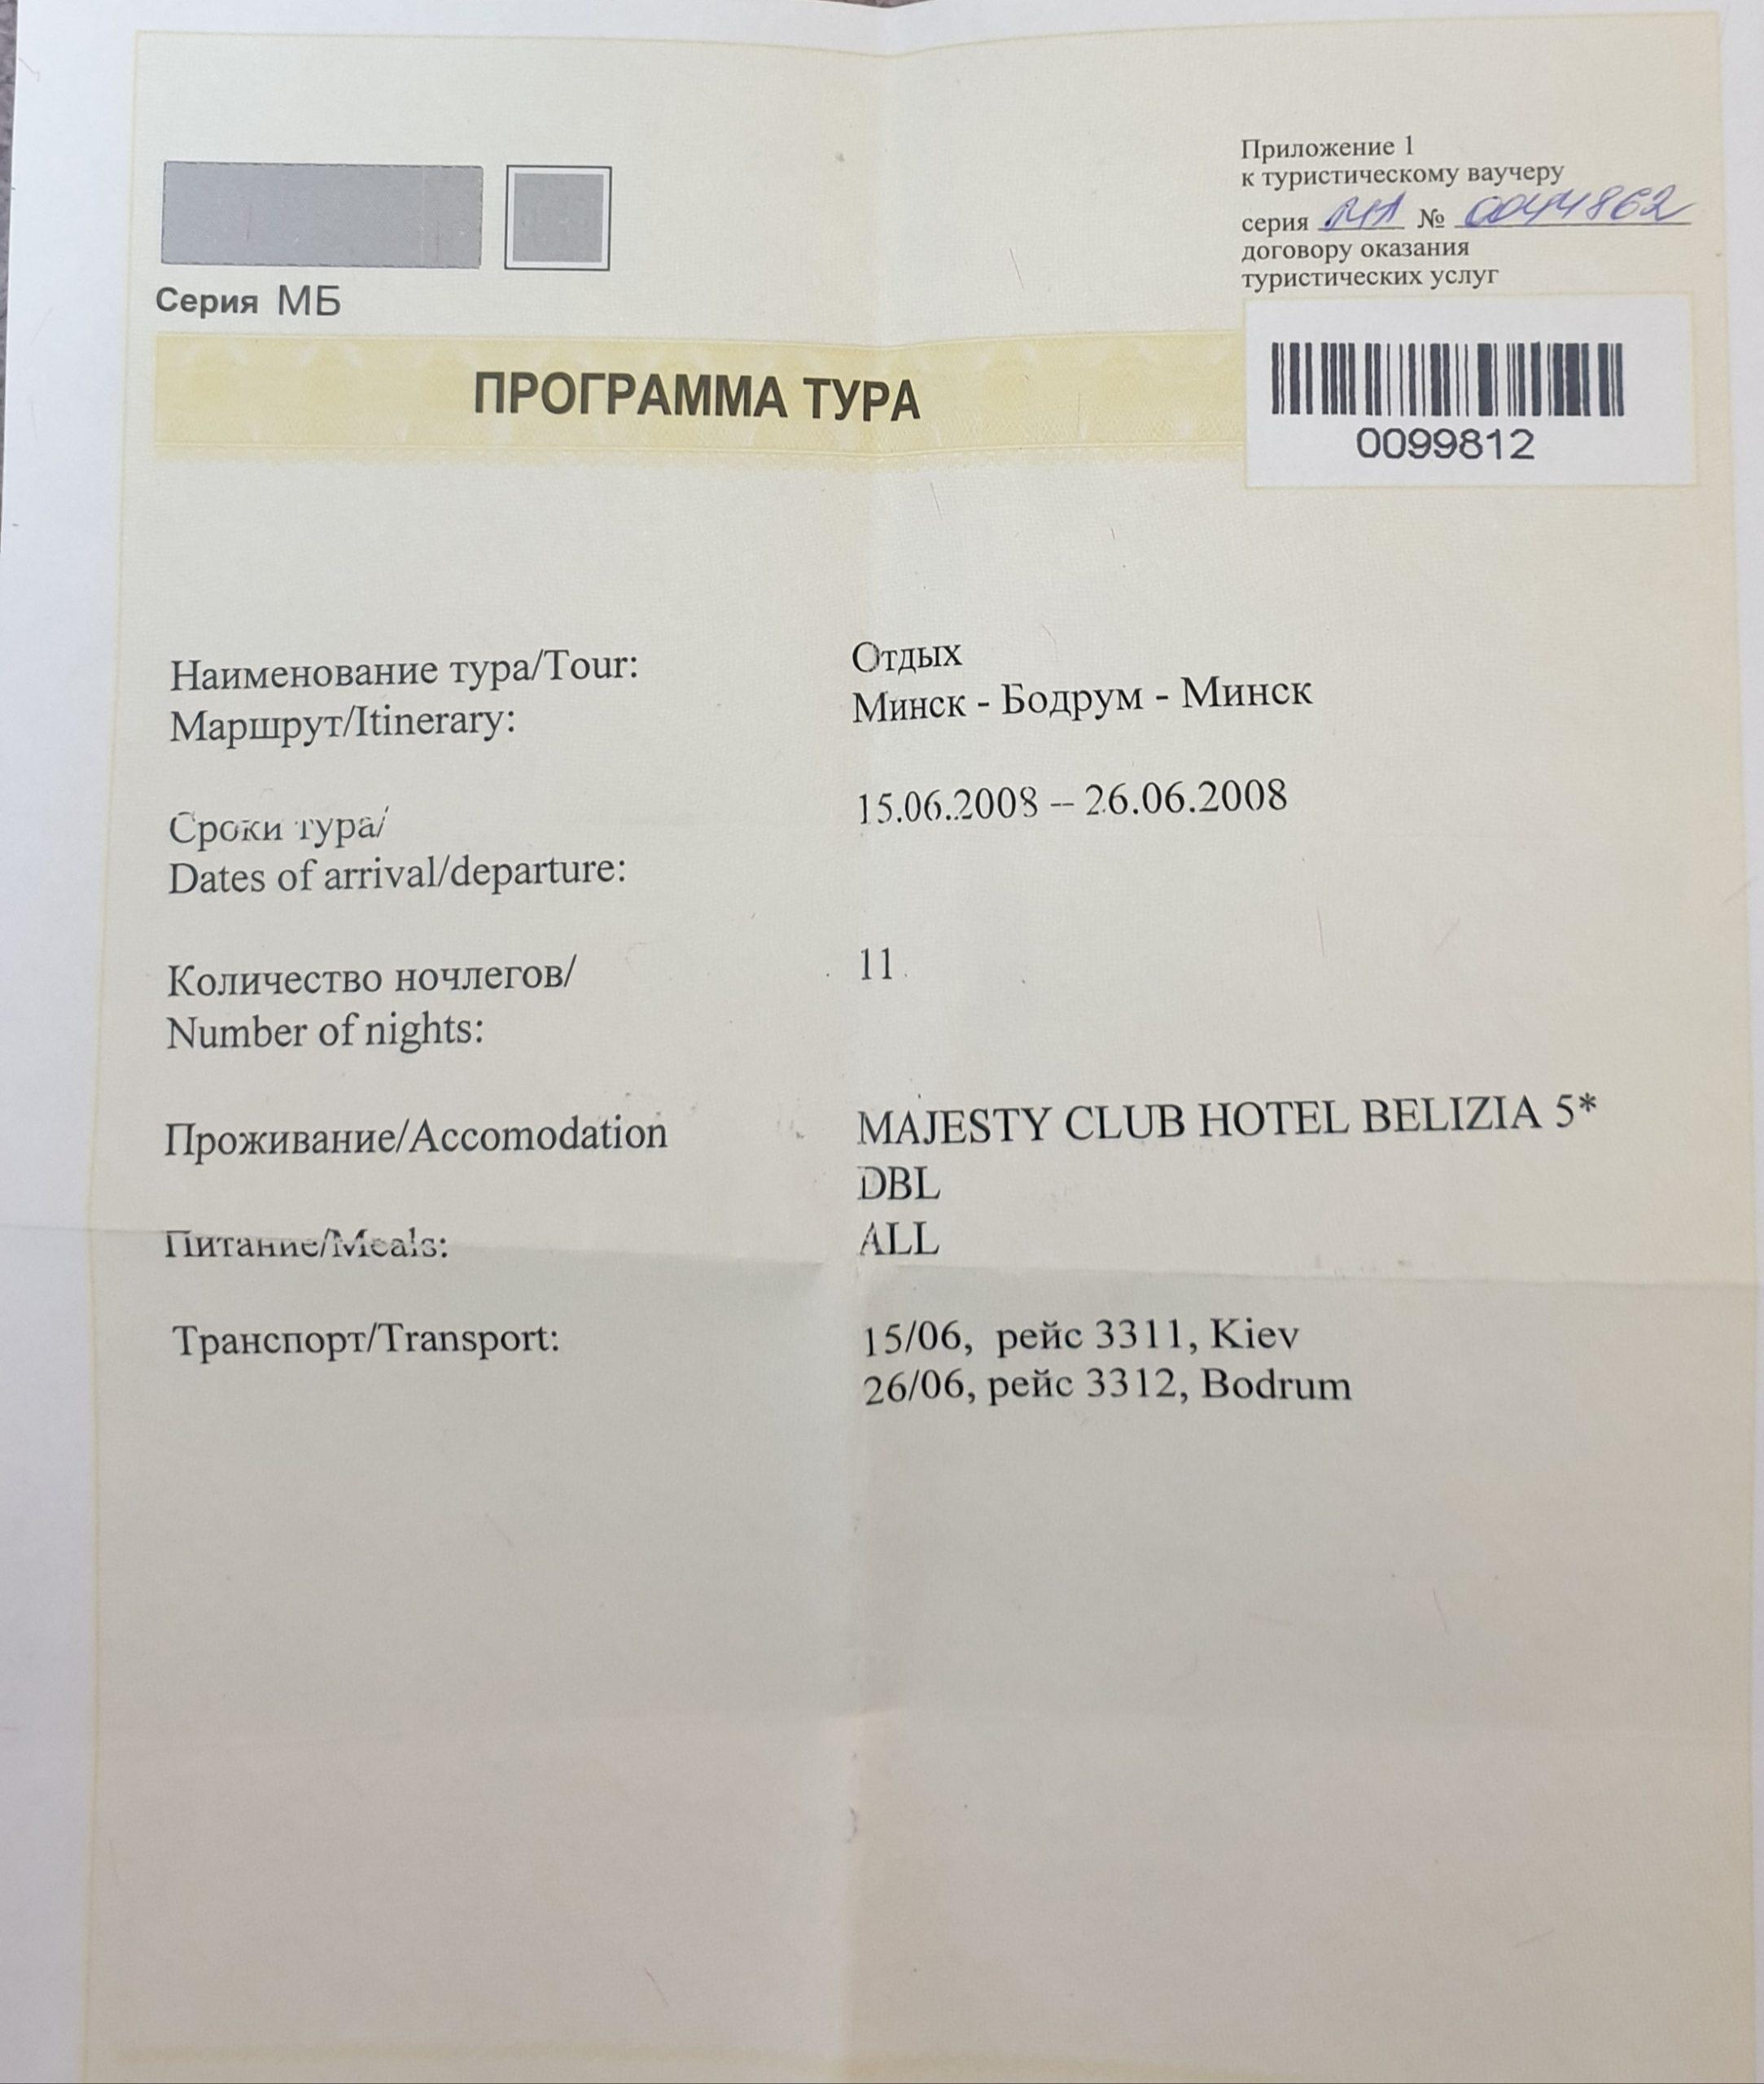 Программа тура Минск-Бодрум-Минск